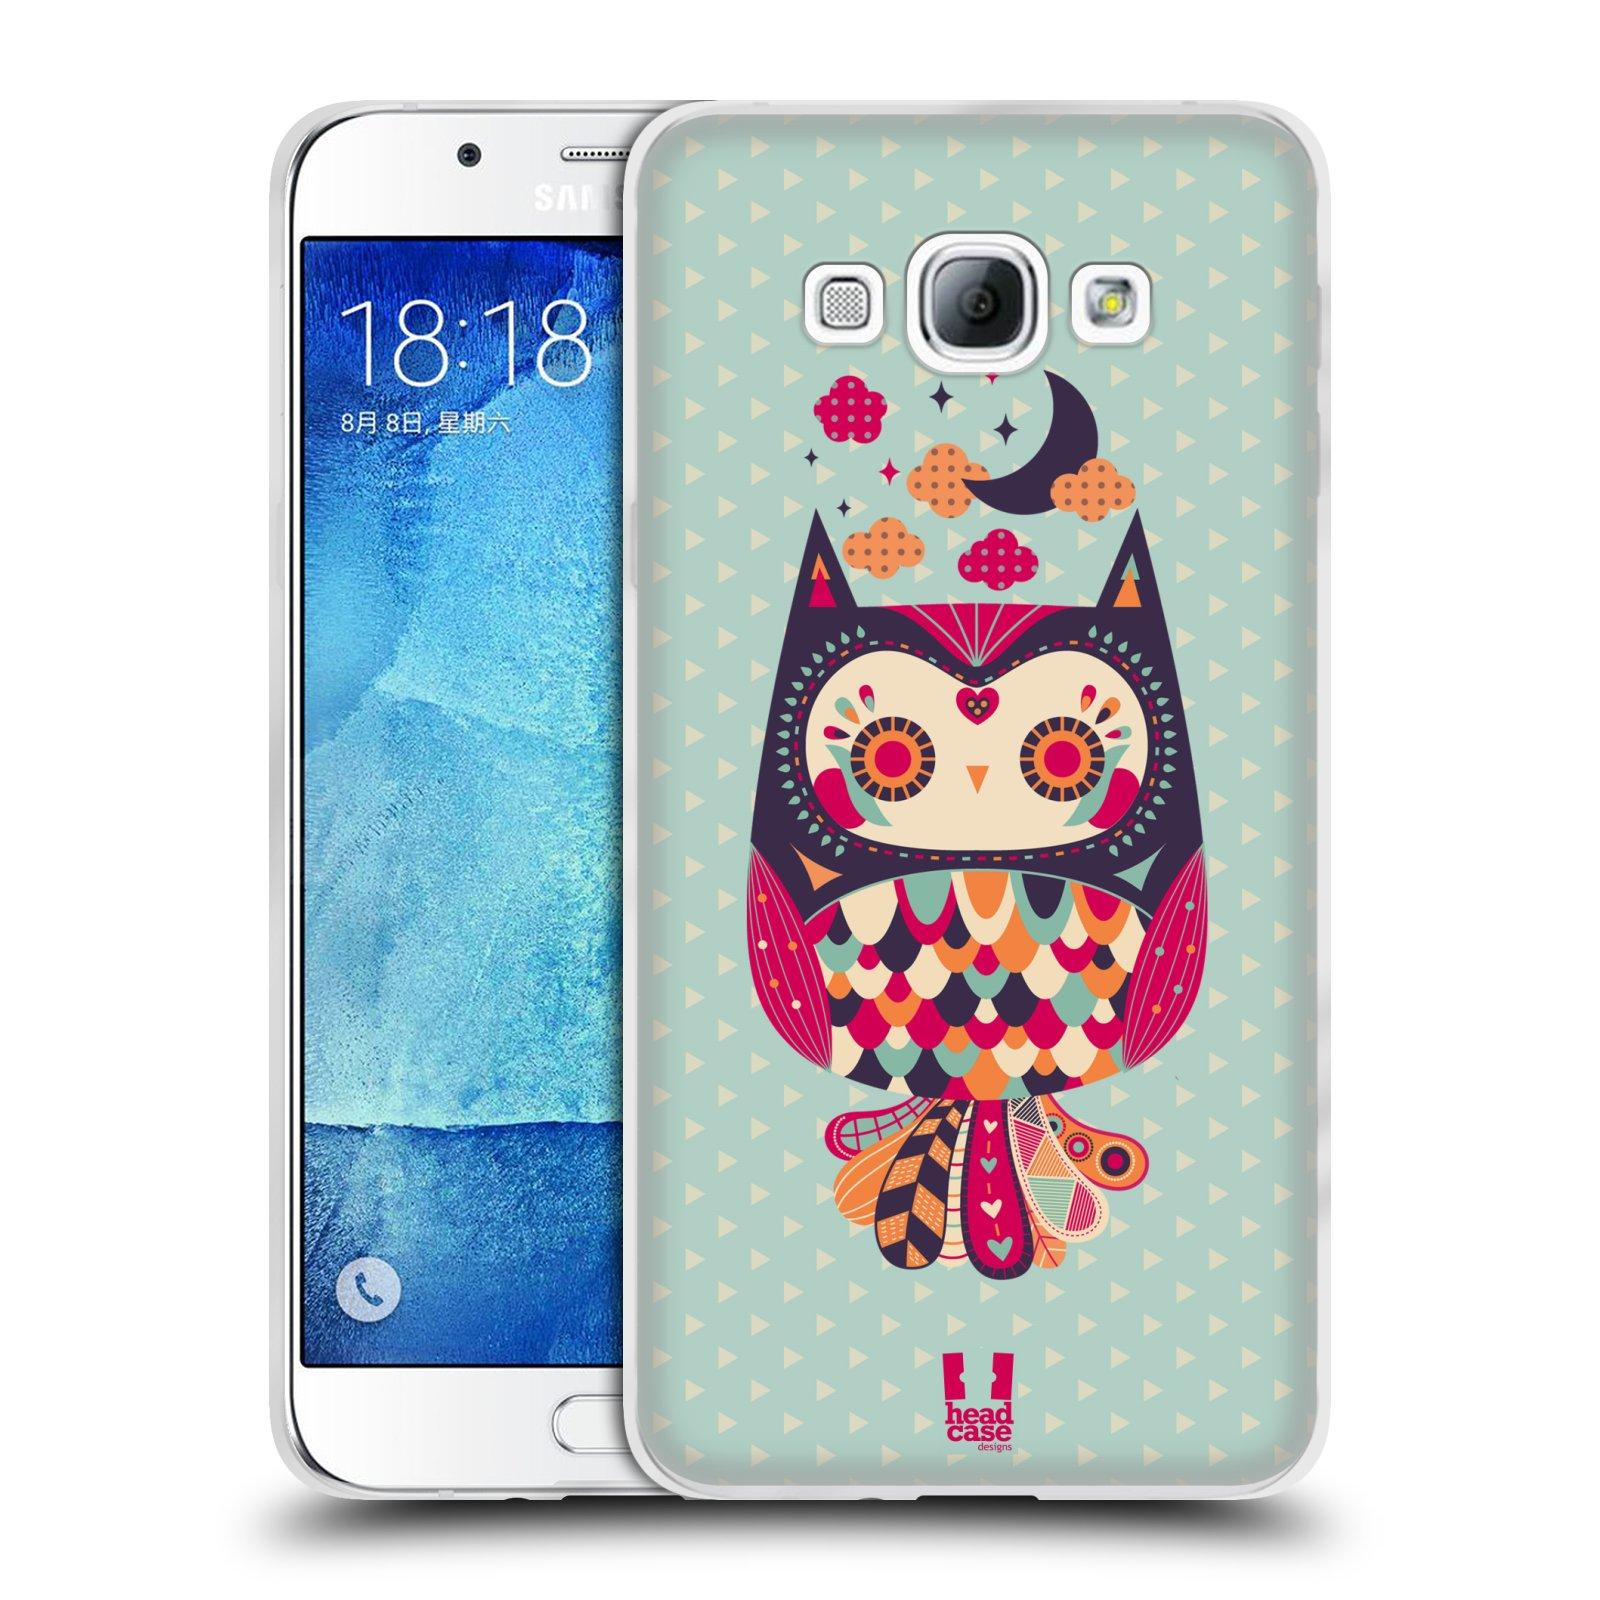 HEAD CASE silikonový obal na mobil Samsung Galaxy A8 vzor Stmívání sovička růžová a fialová